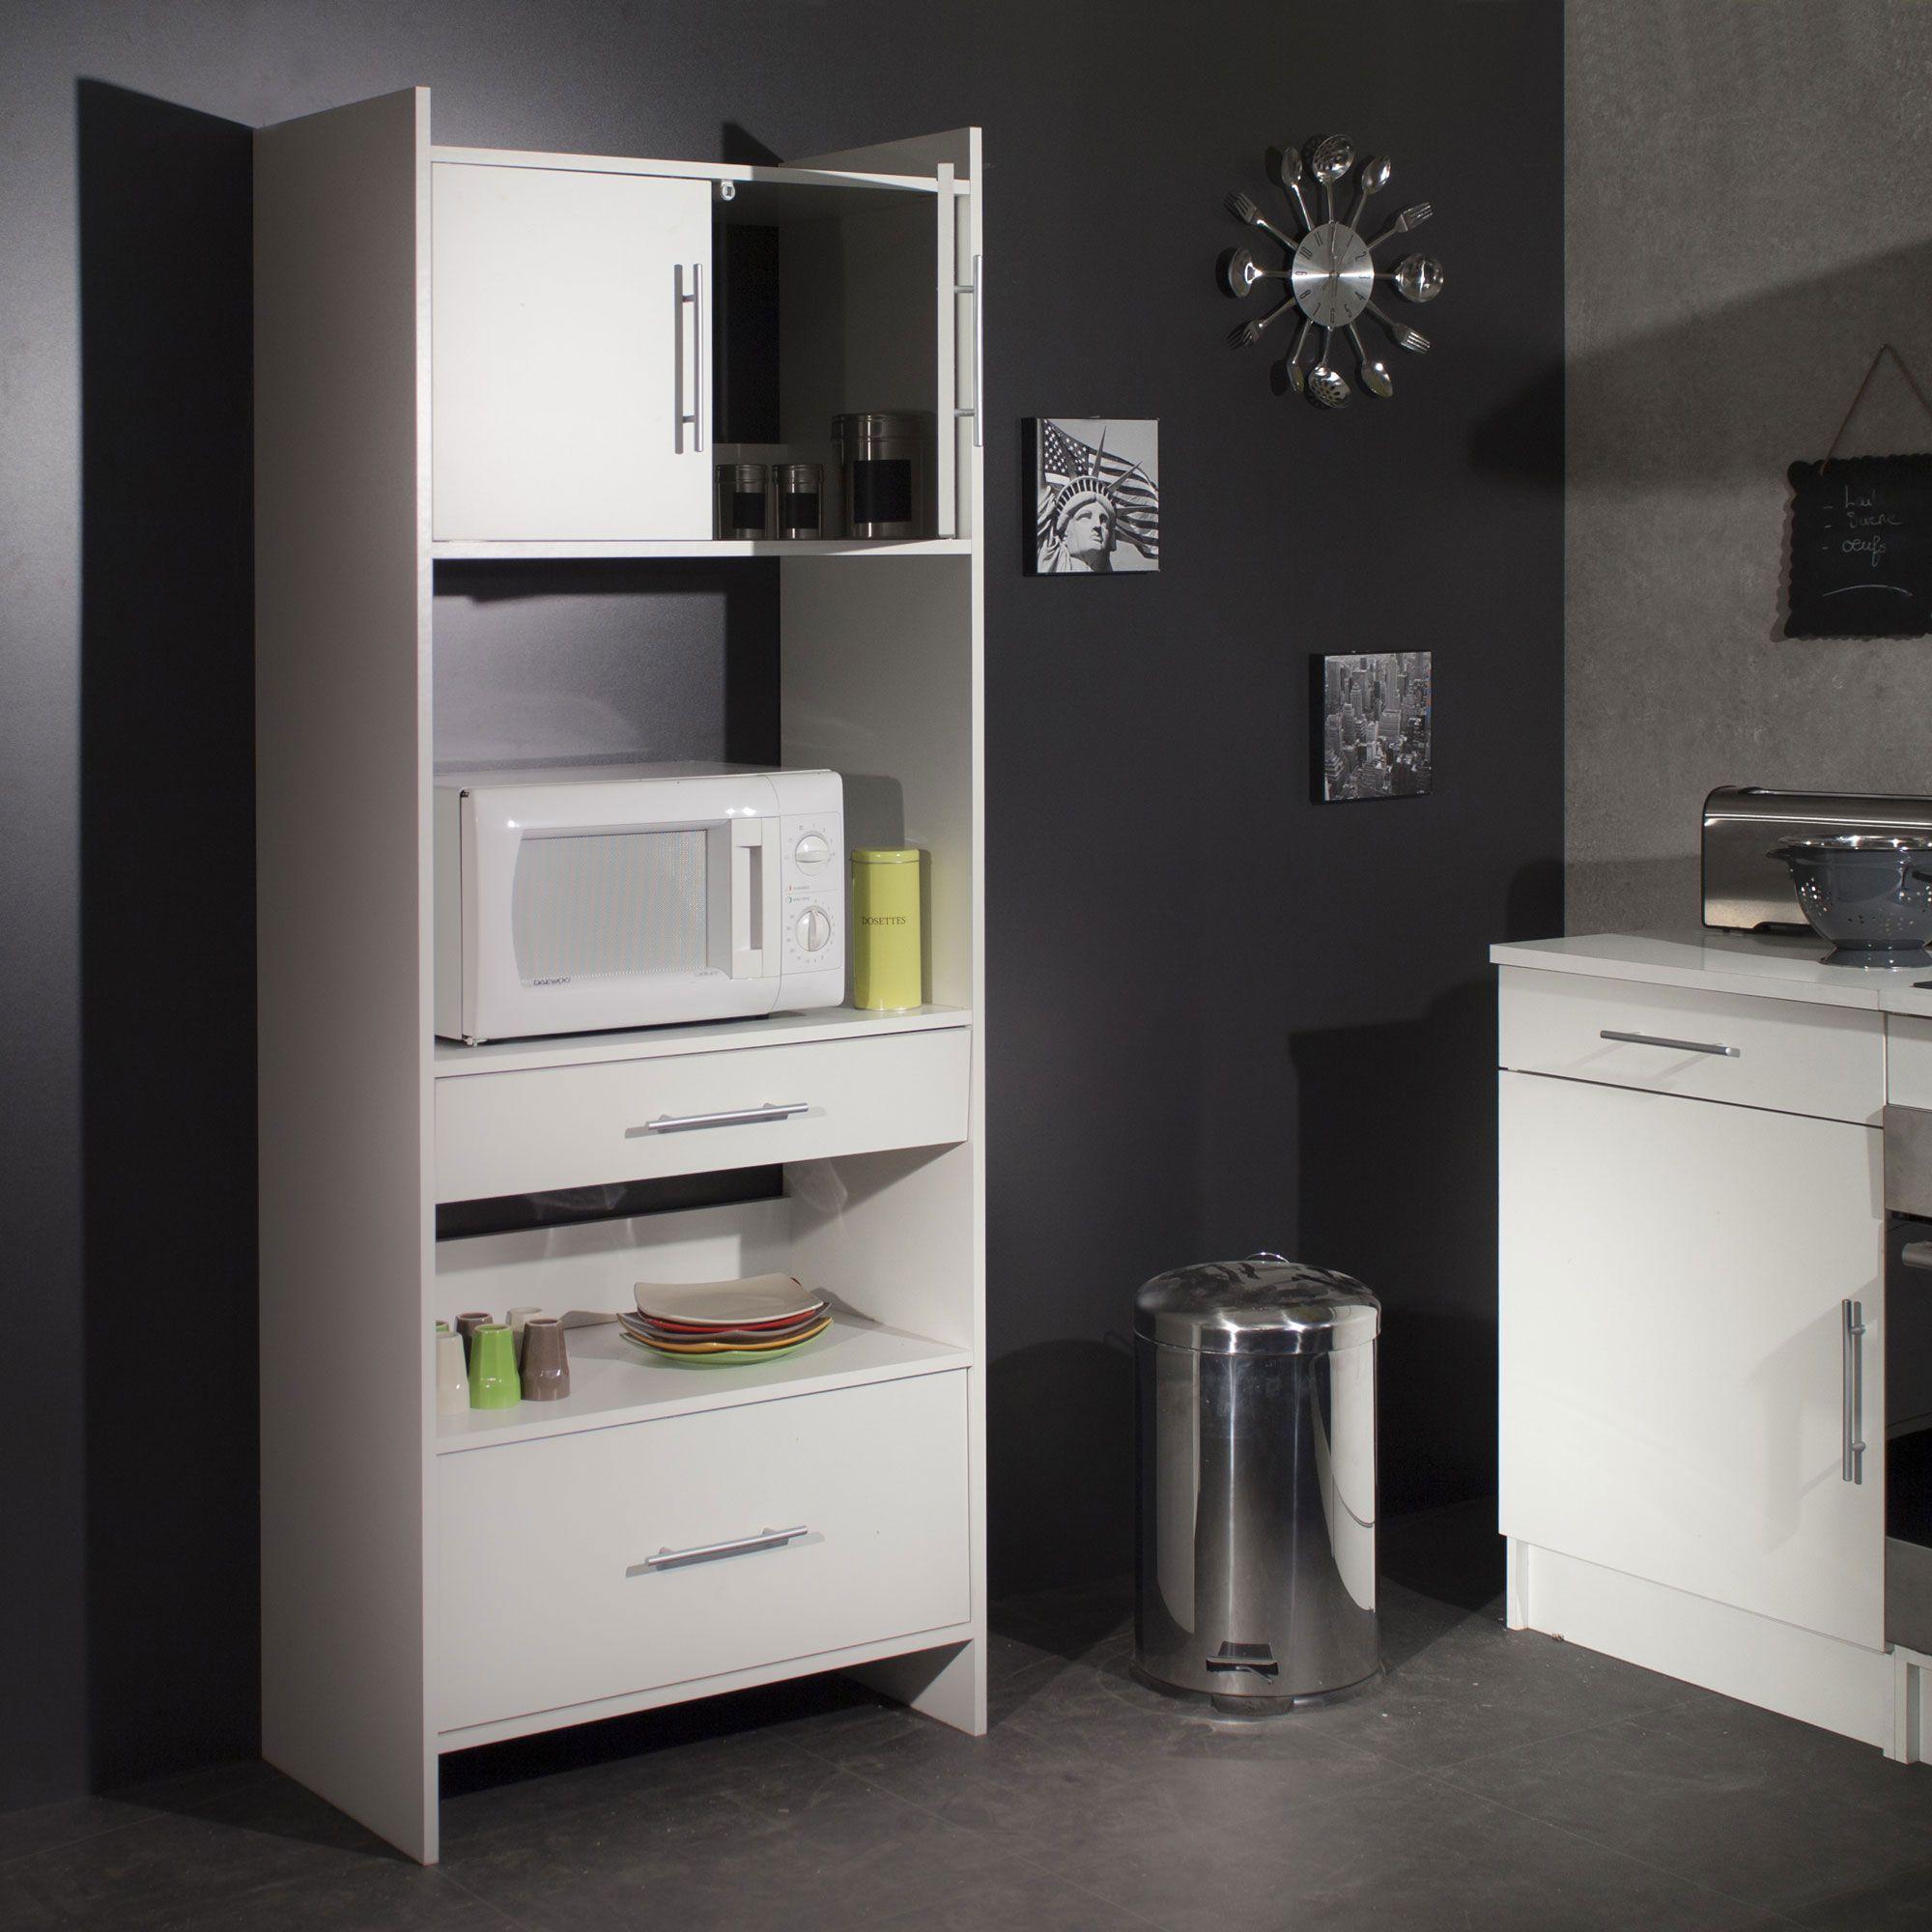 meuble desserte micro ondes l70xp40xh170cm simply meuble. Black Bedroom Furniture Sets. Home Design Ideas